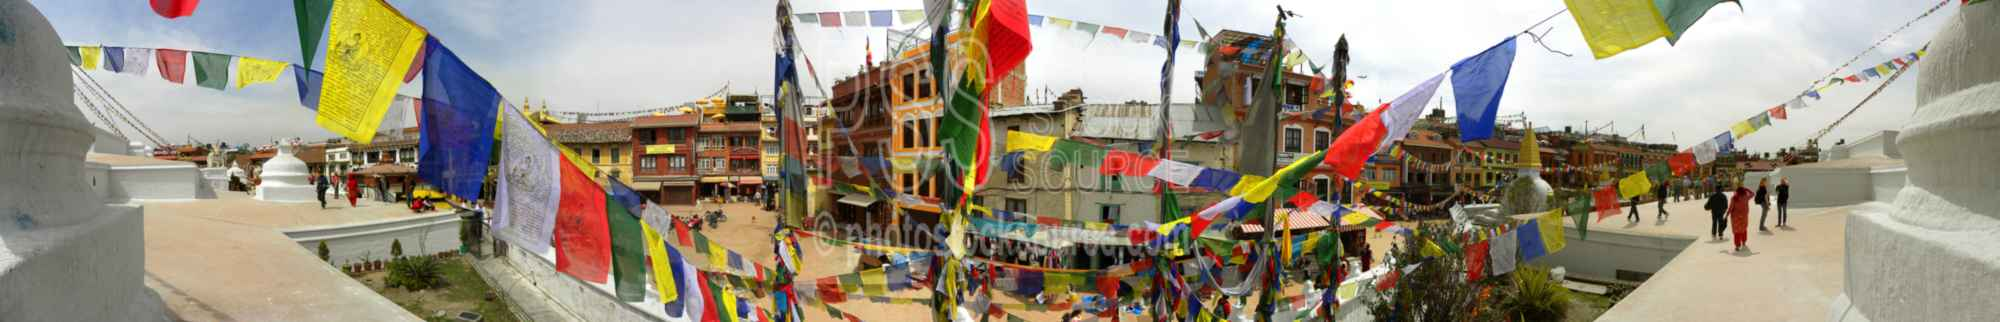 Boudhanath Stupa Prayer Flags